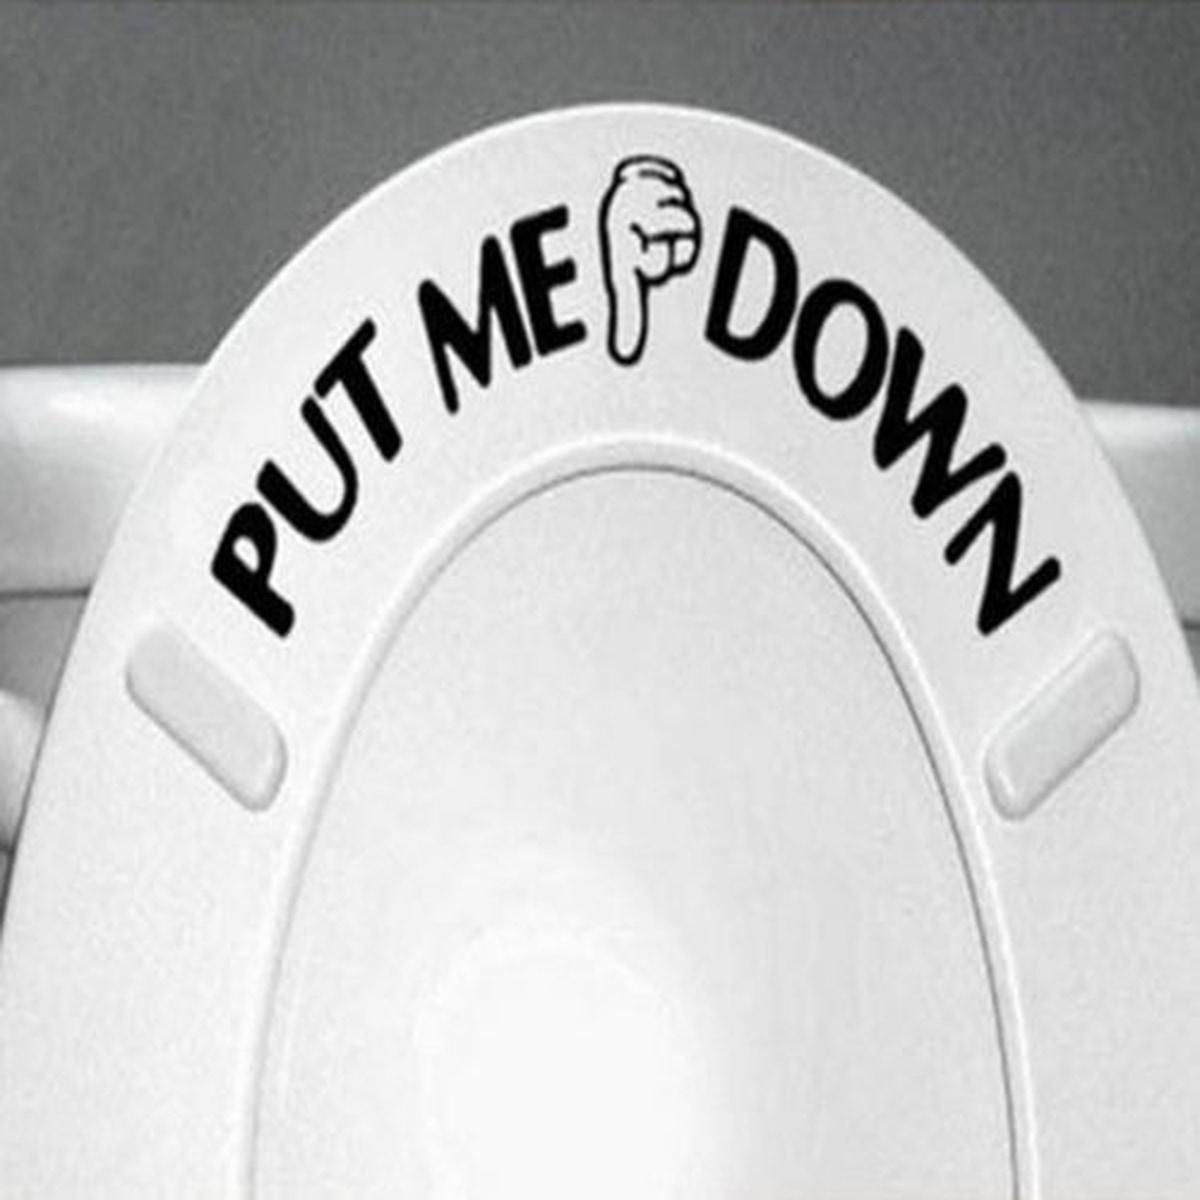 Put me down- Wallsticker